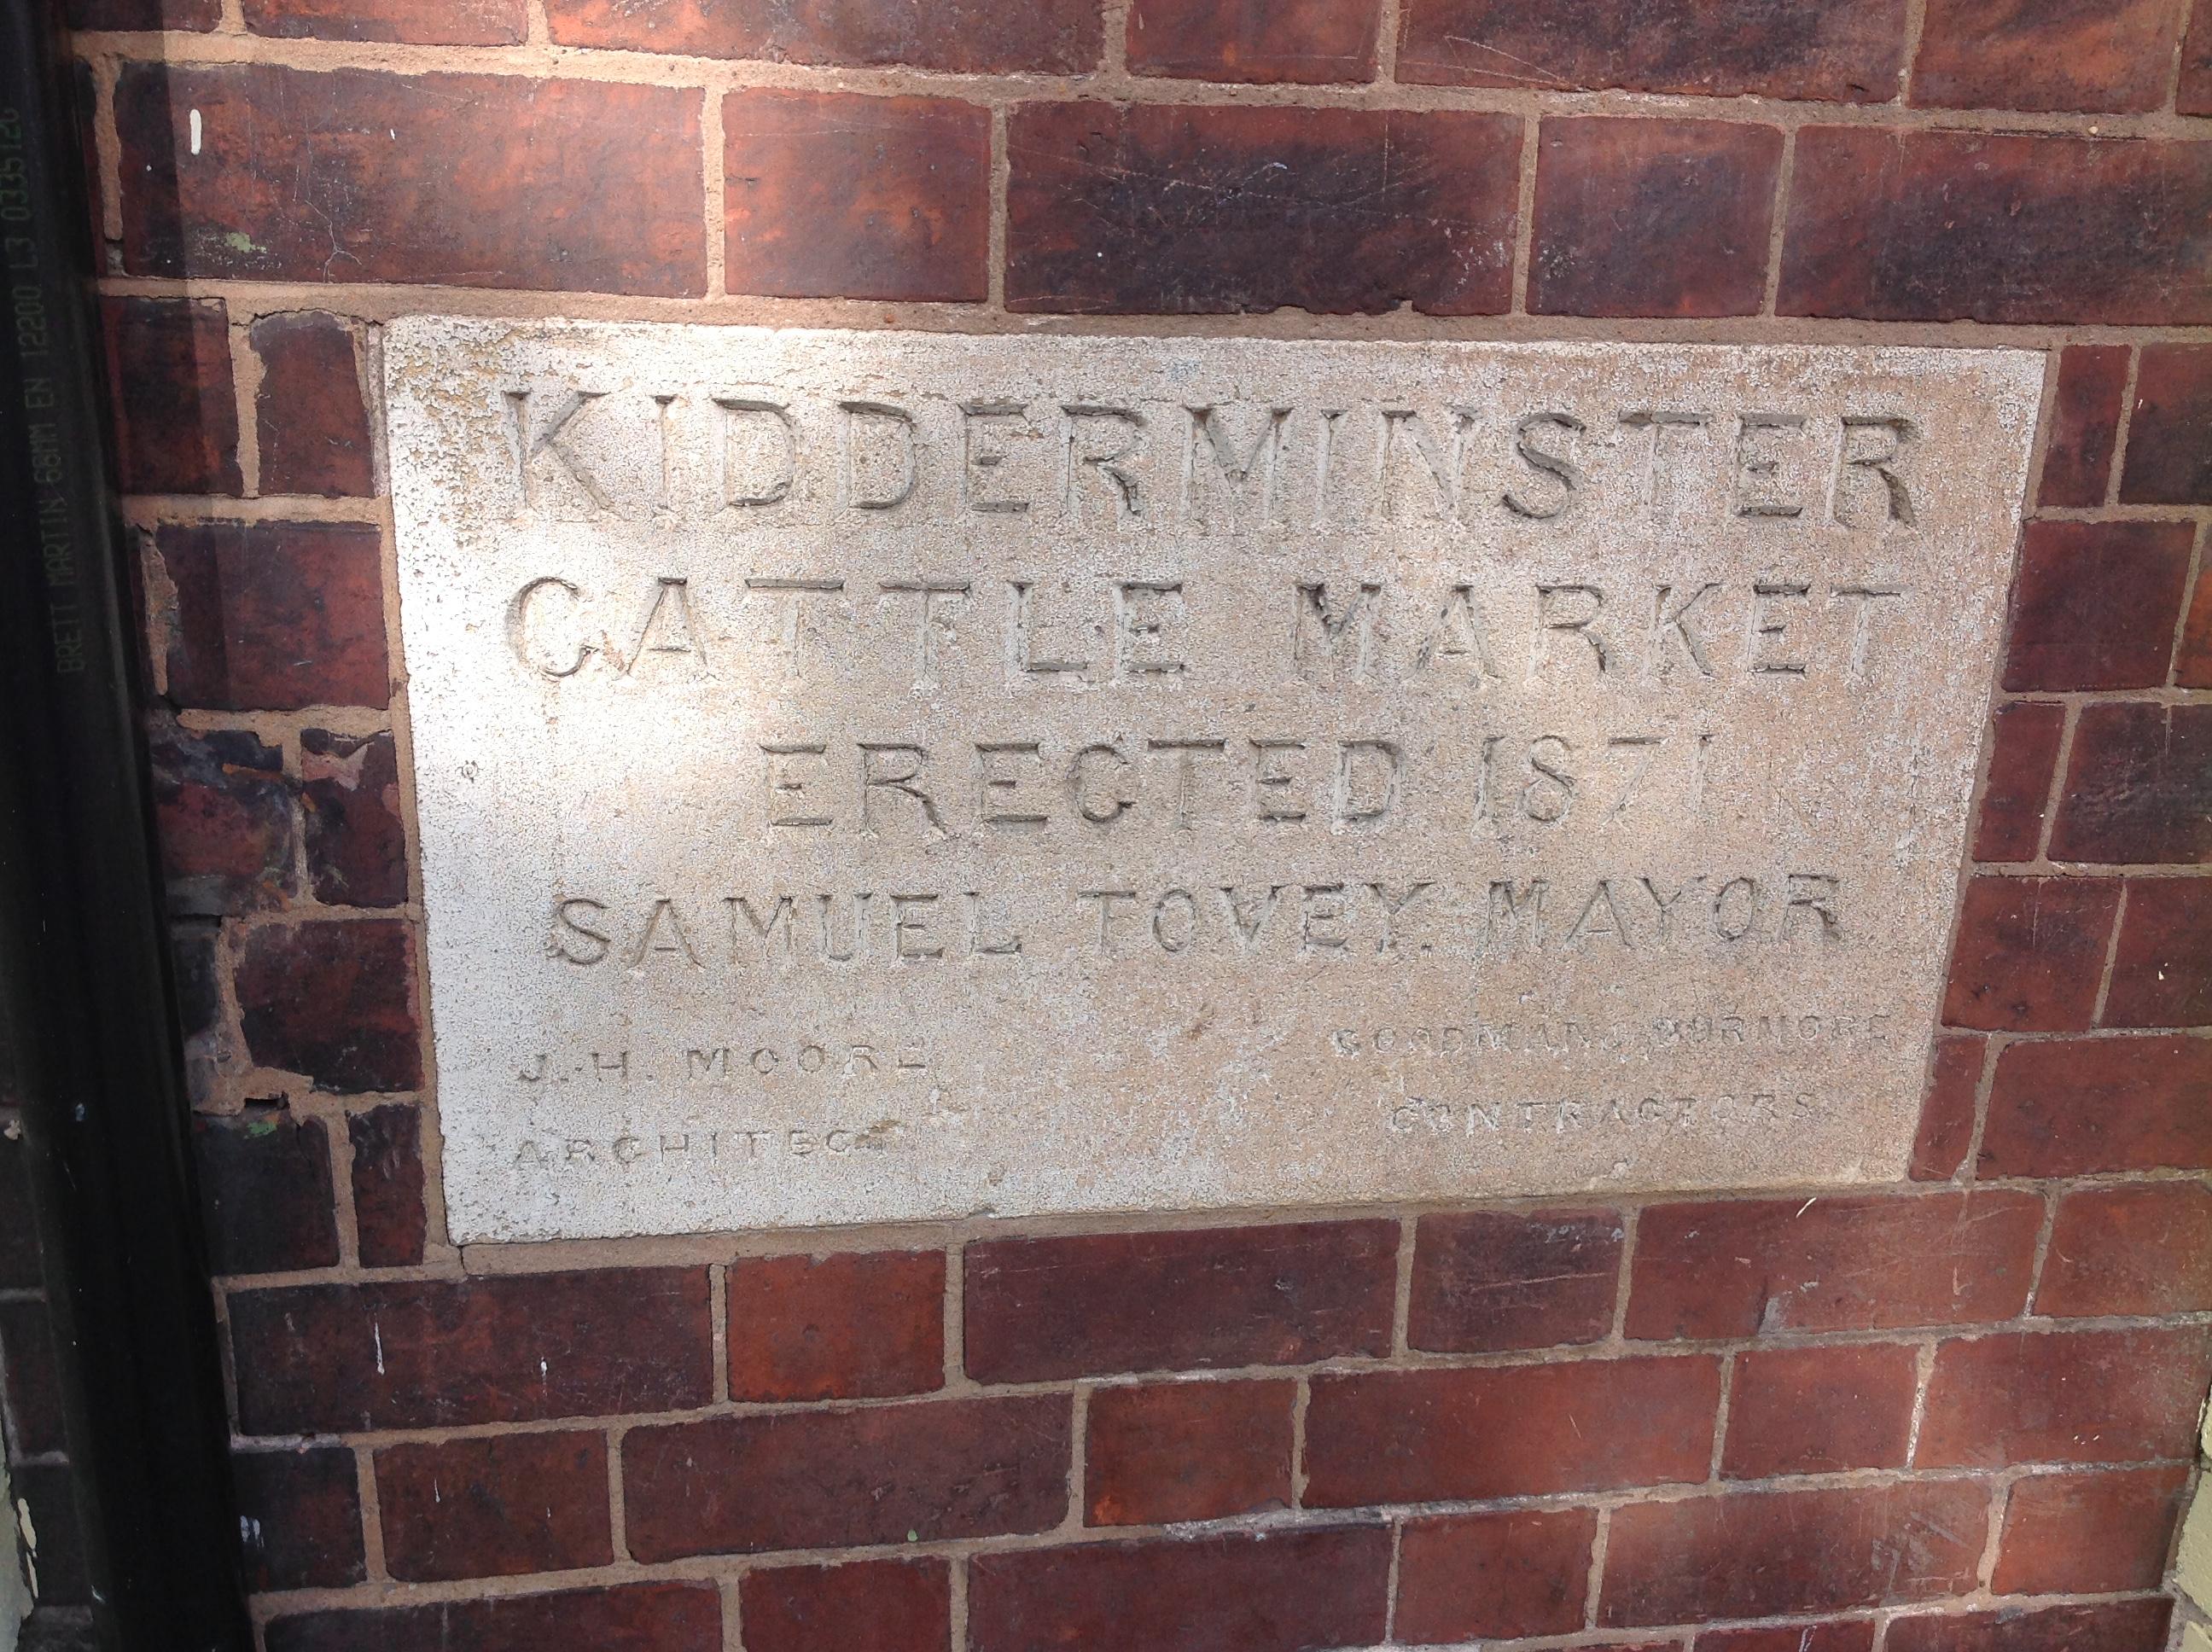 Cattle Market, New Road, Kidderminster, 15/08/2015